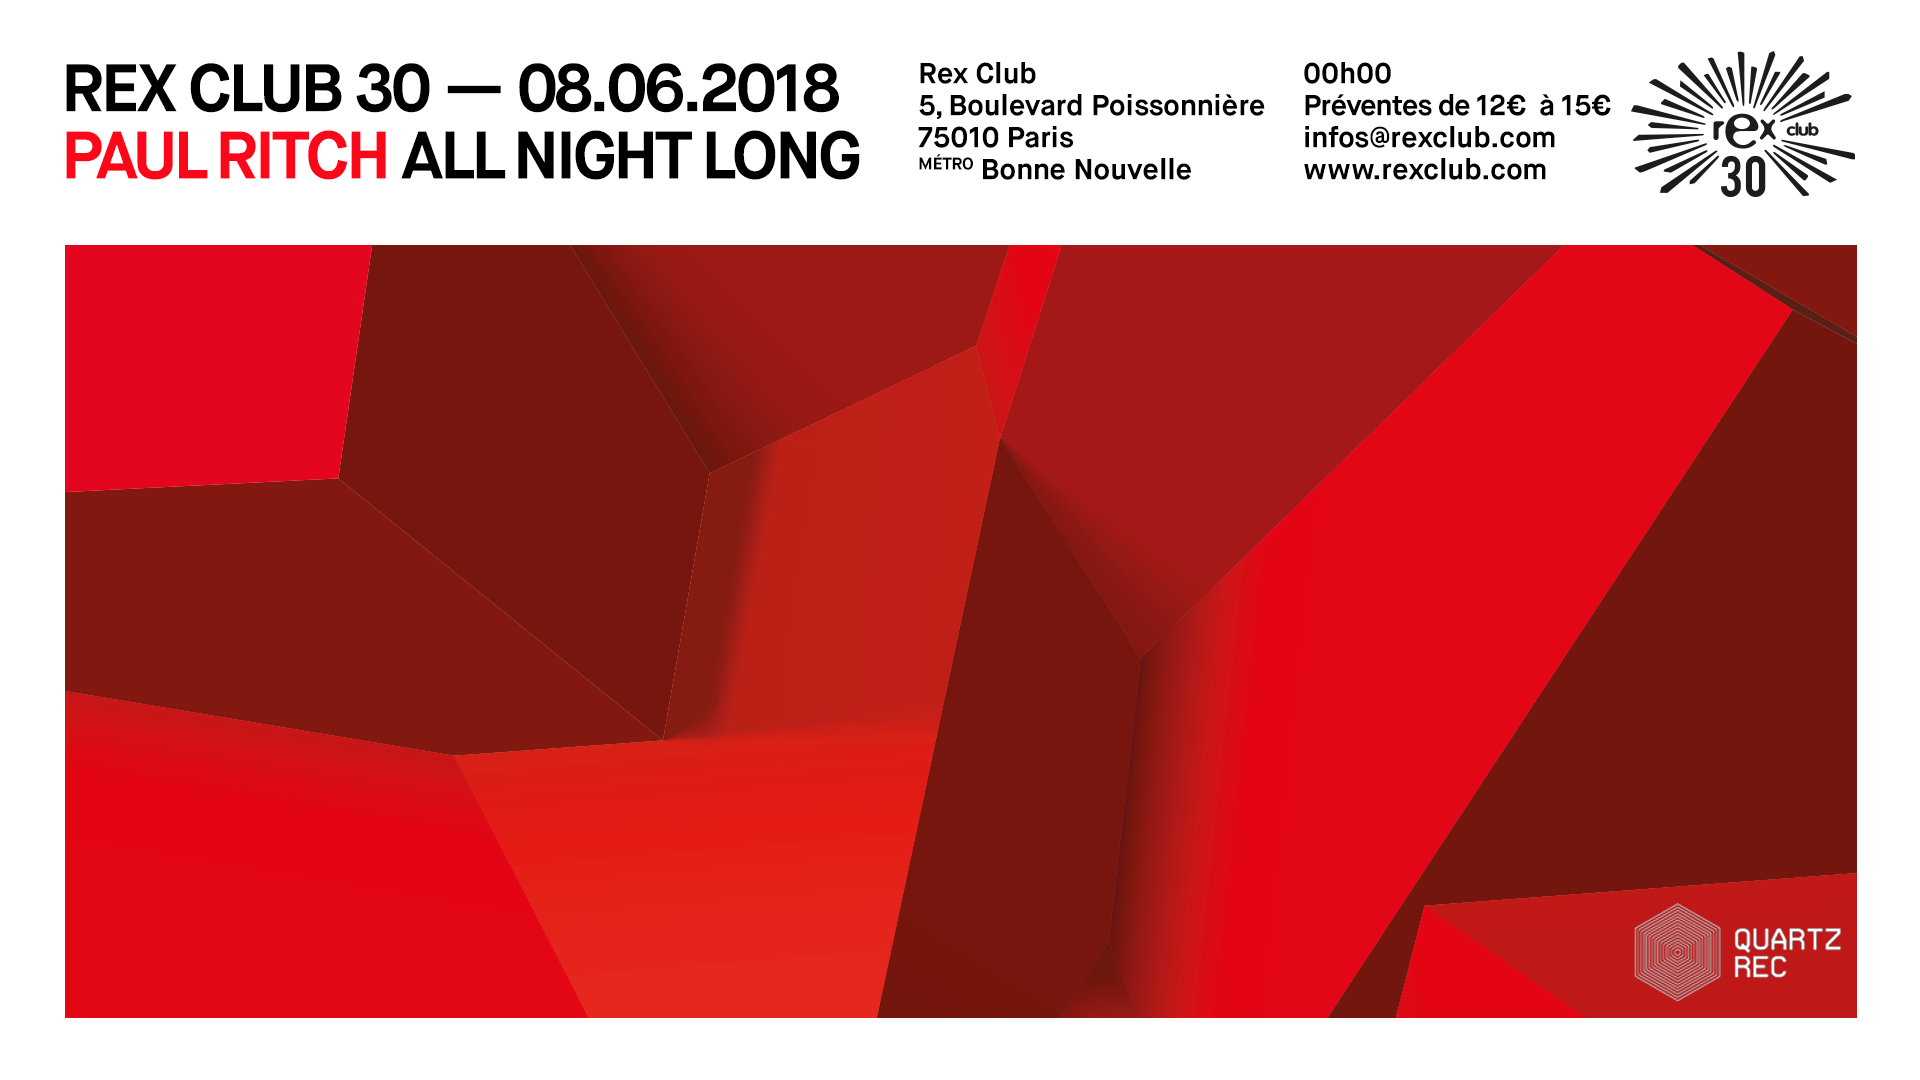 20180608_rex_club_30_paul_ritch_facebook_event_banner_1920x1080